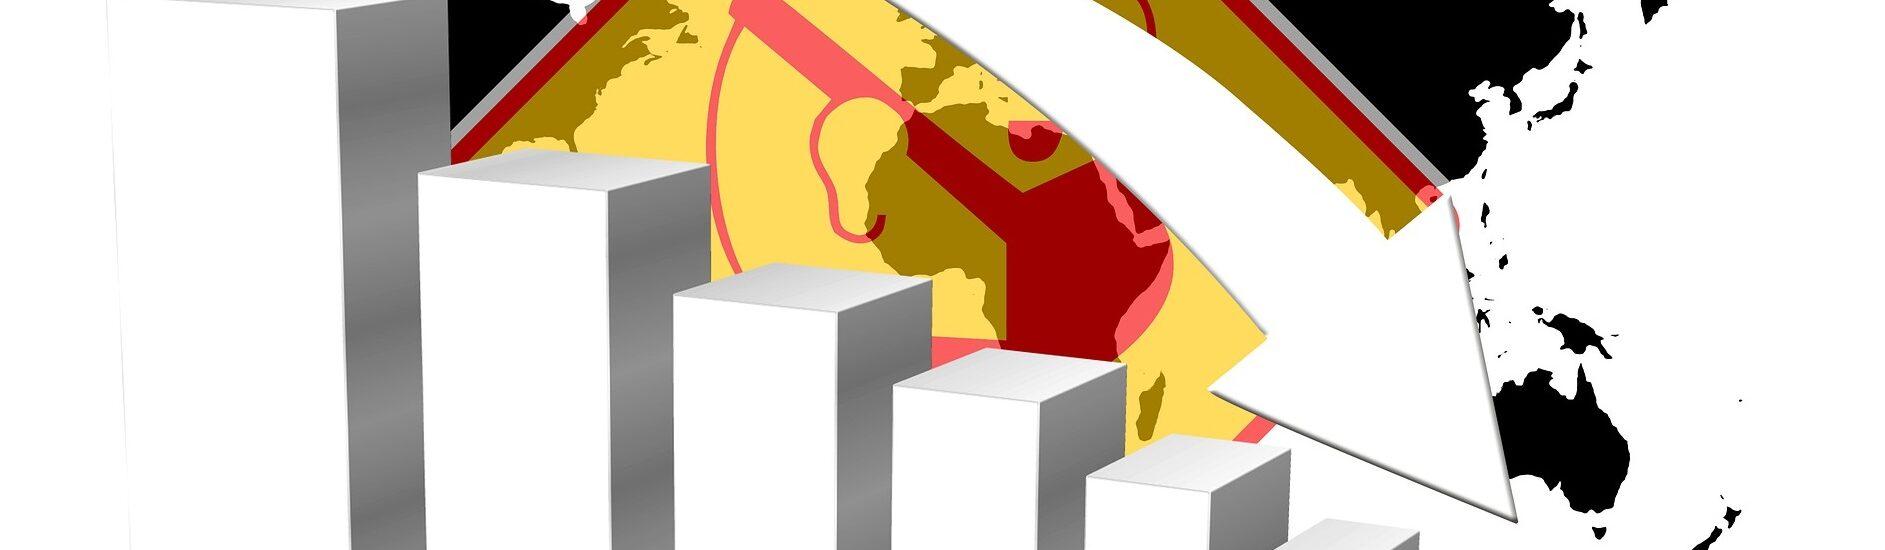 Tραπεζίτες, αξία της ανθρώπινης ζωής και κόστος καραντίνας